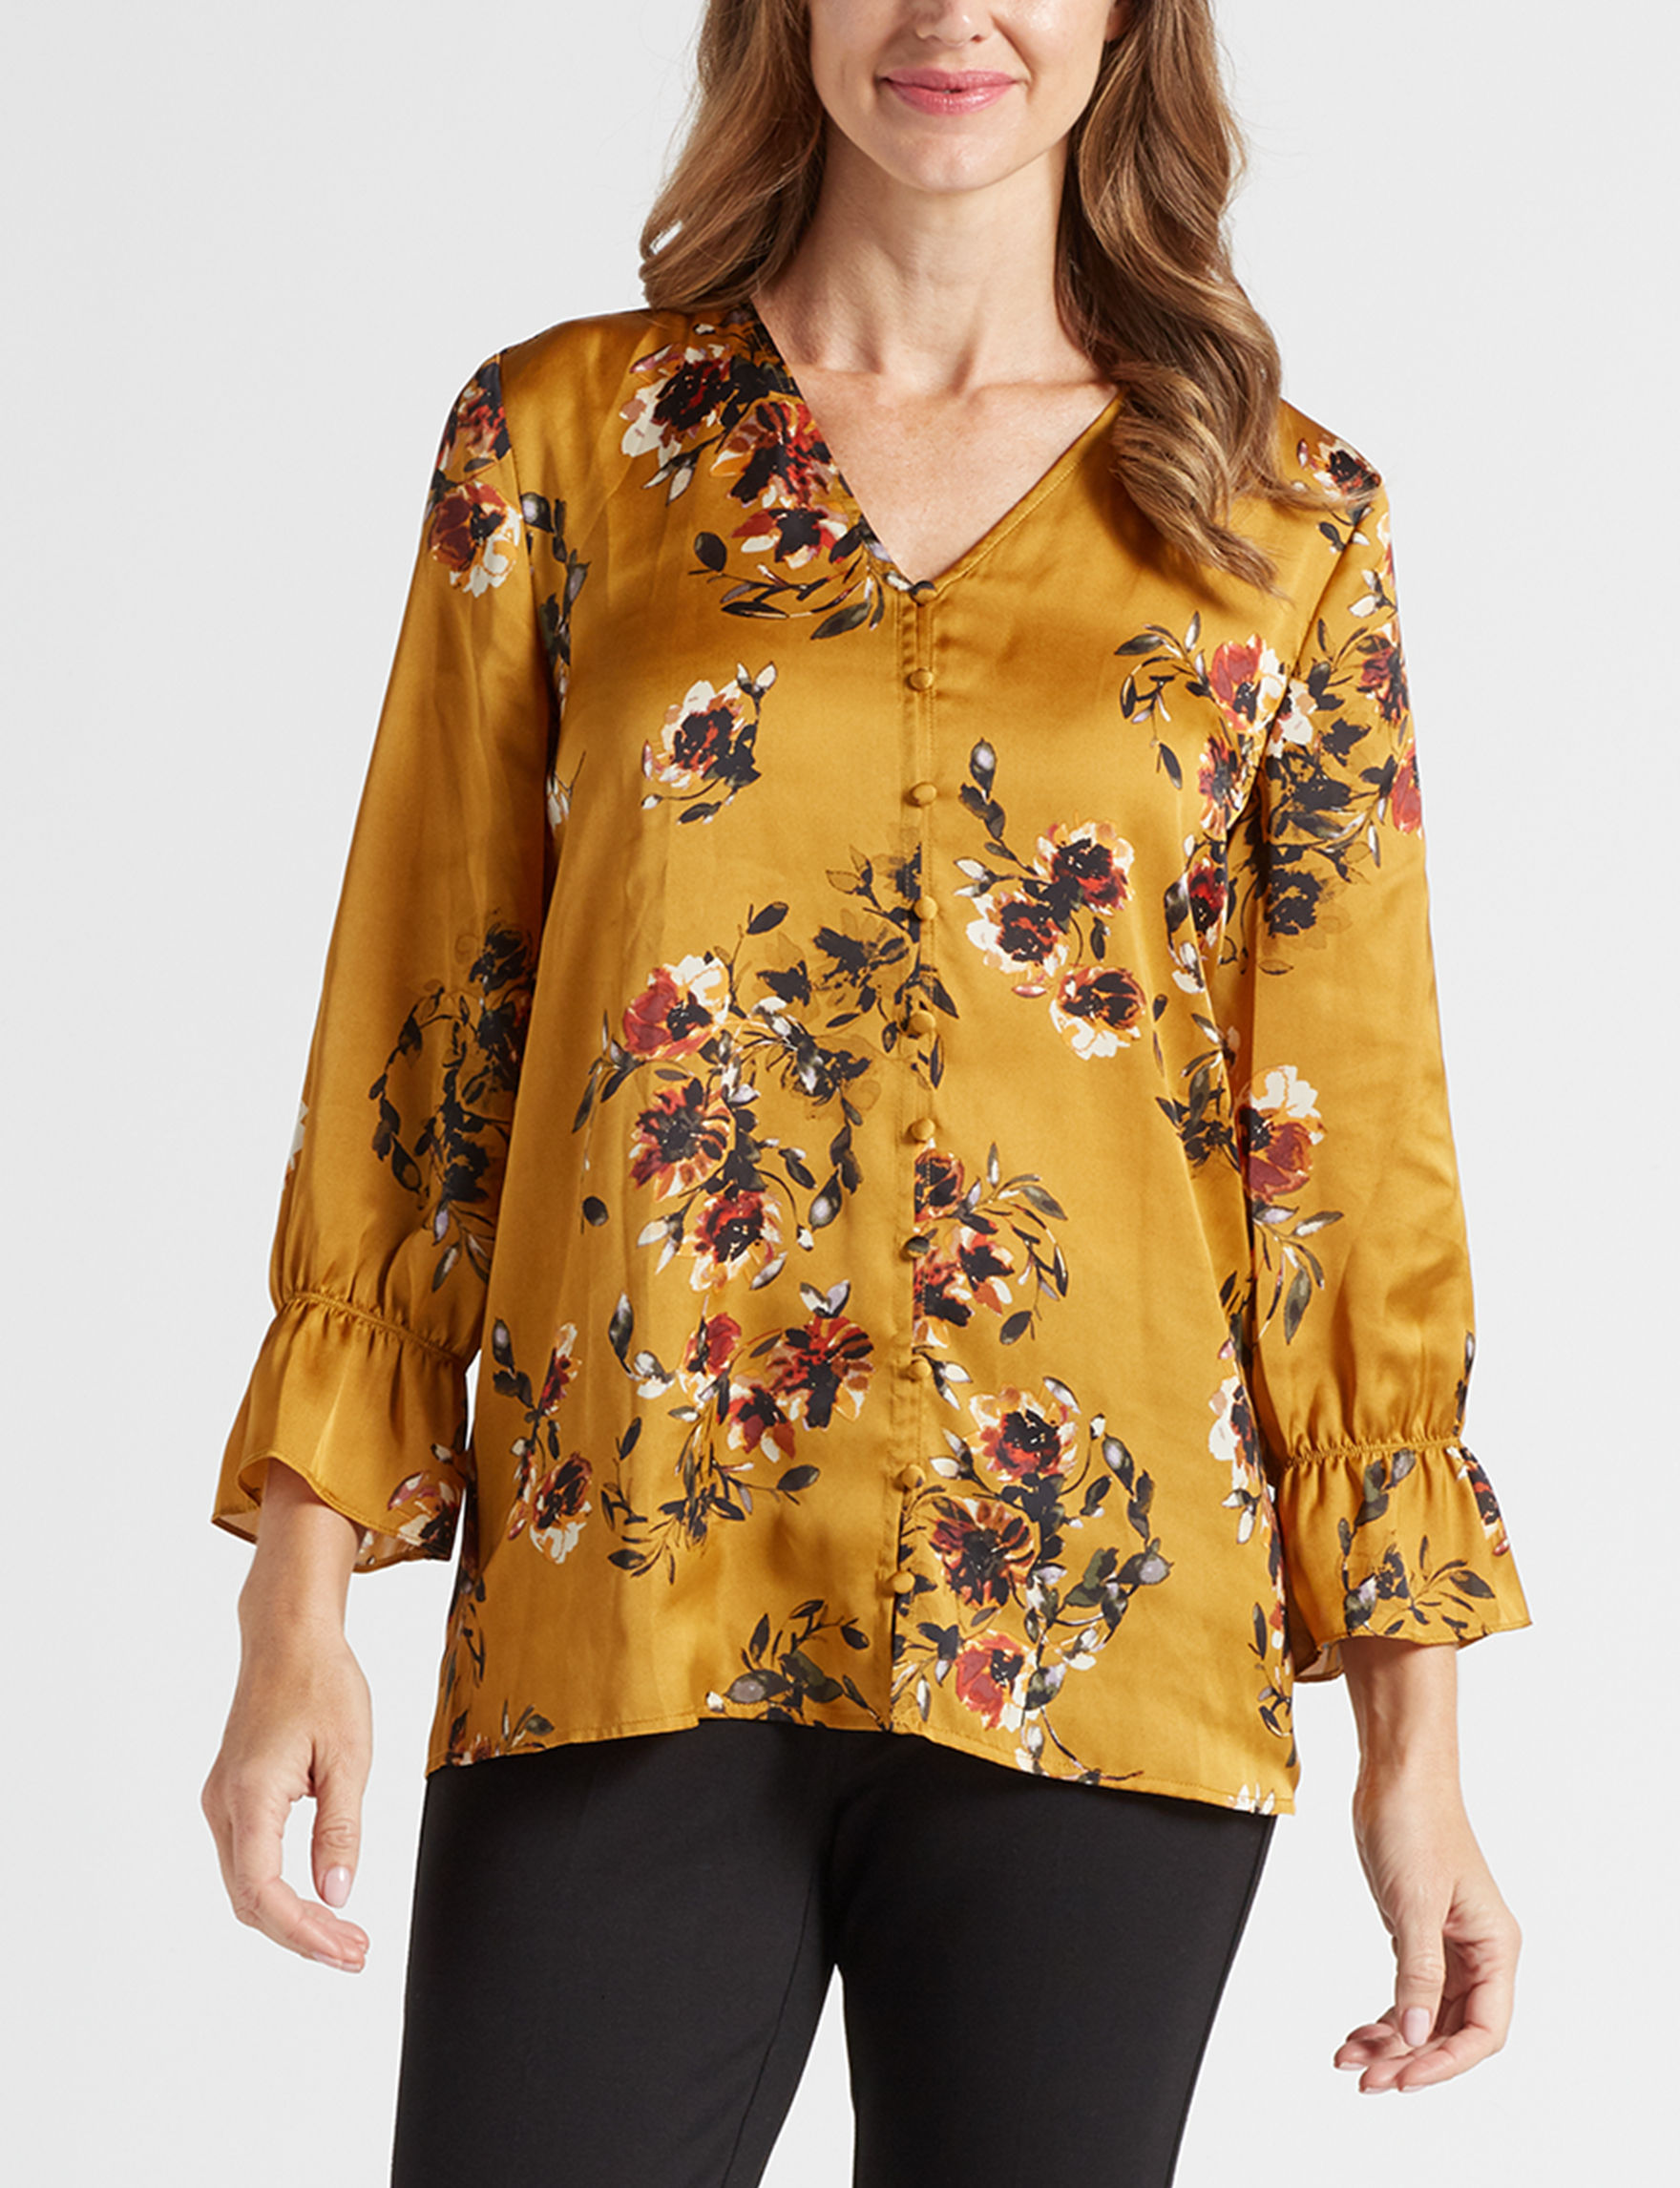 Rebecca Malone Mustard Floral Shirts & Blouses